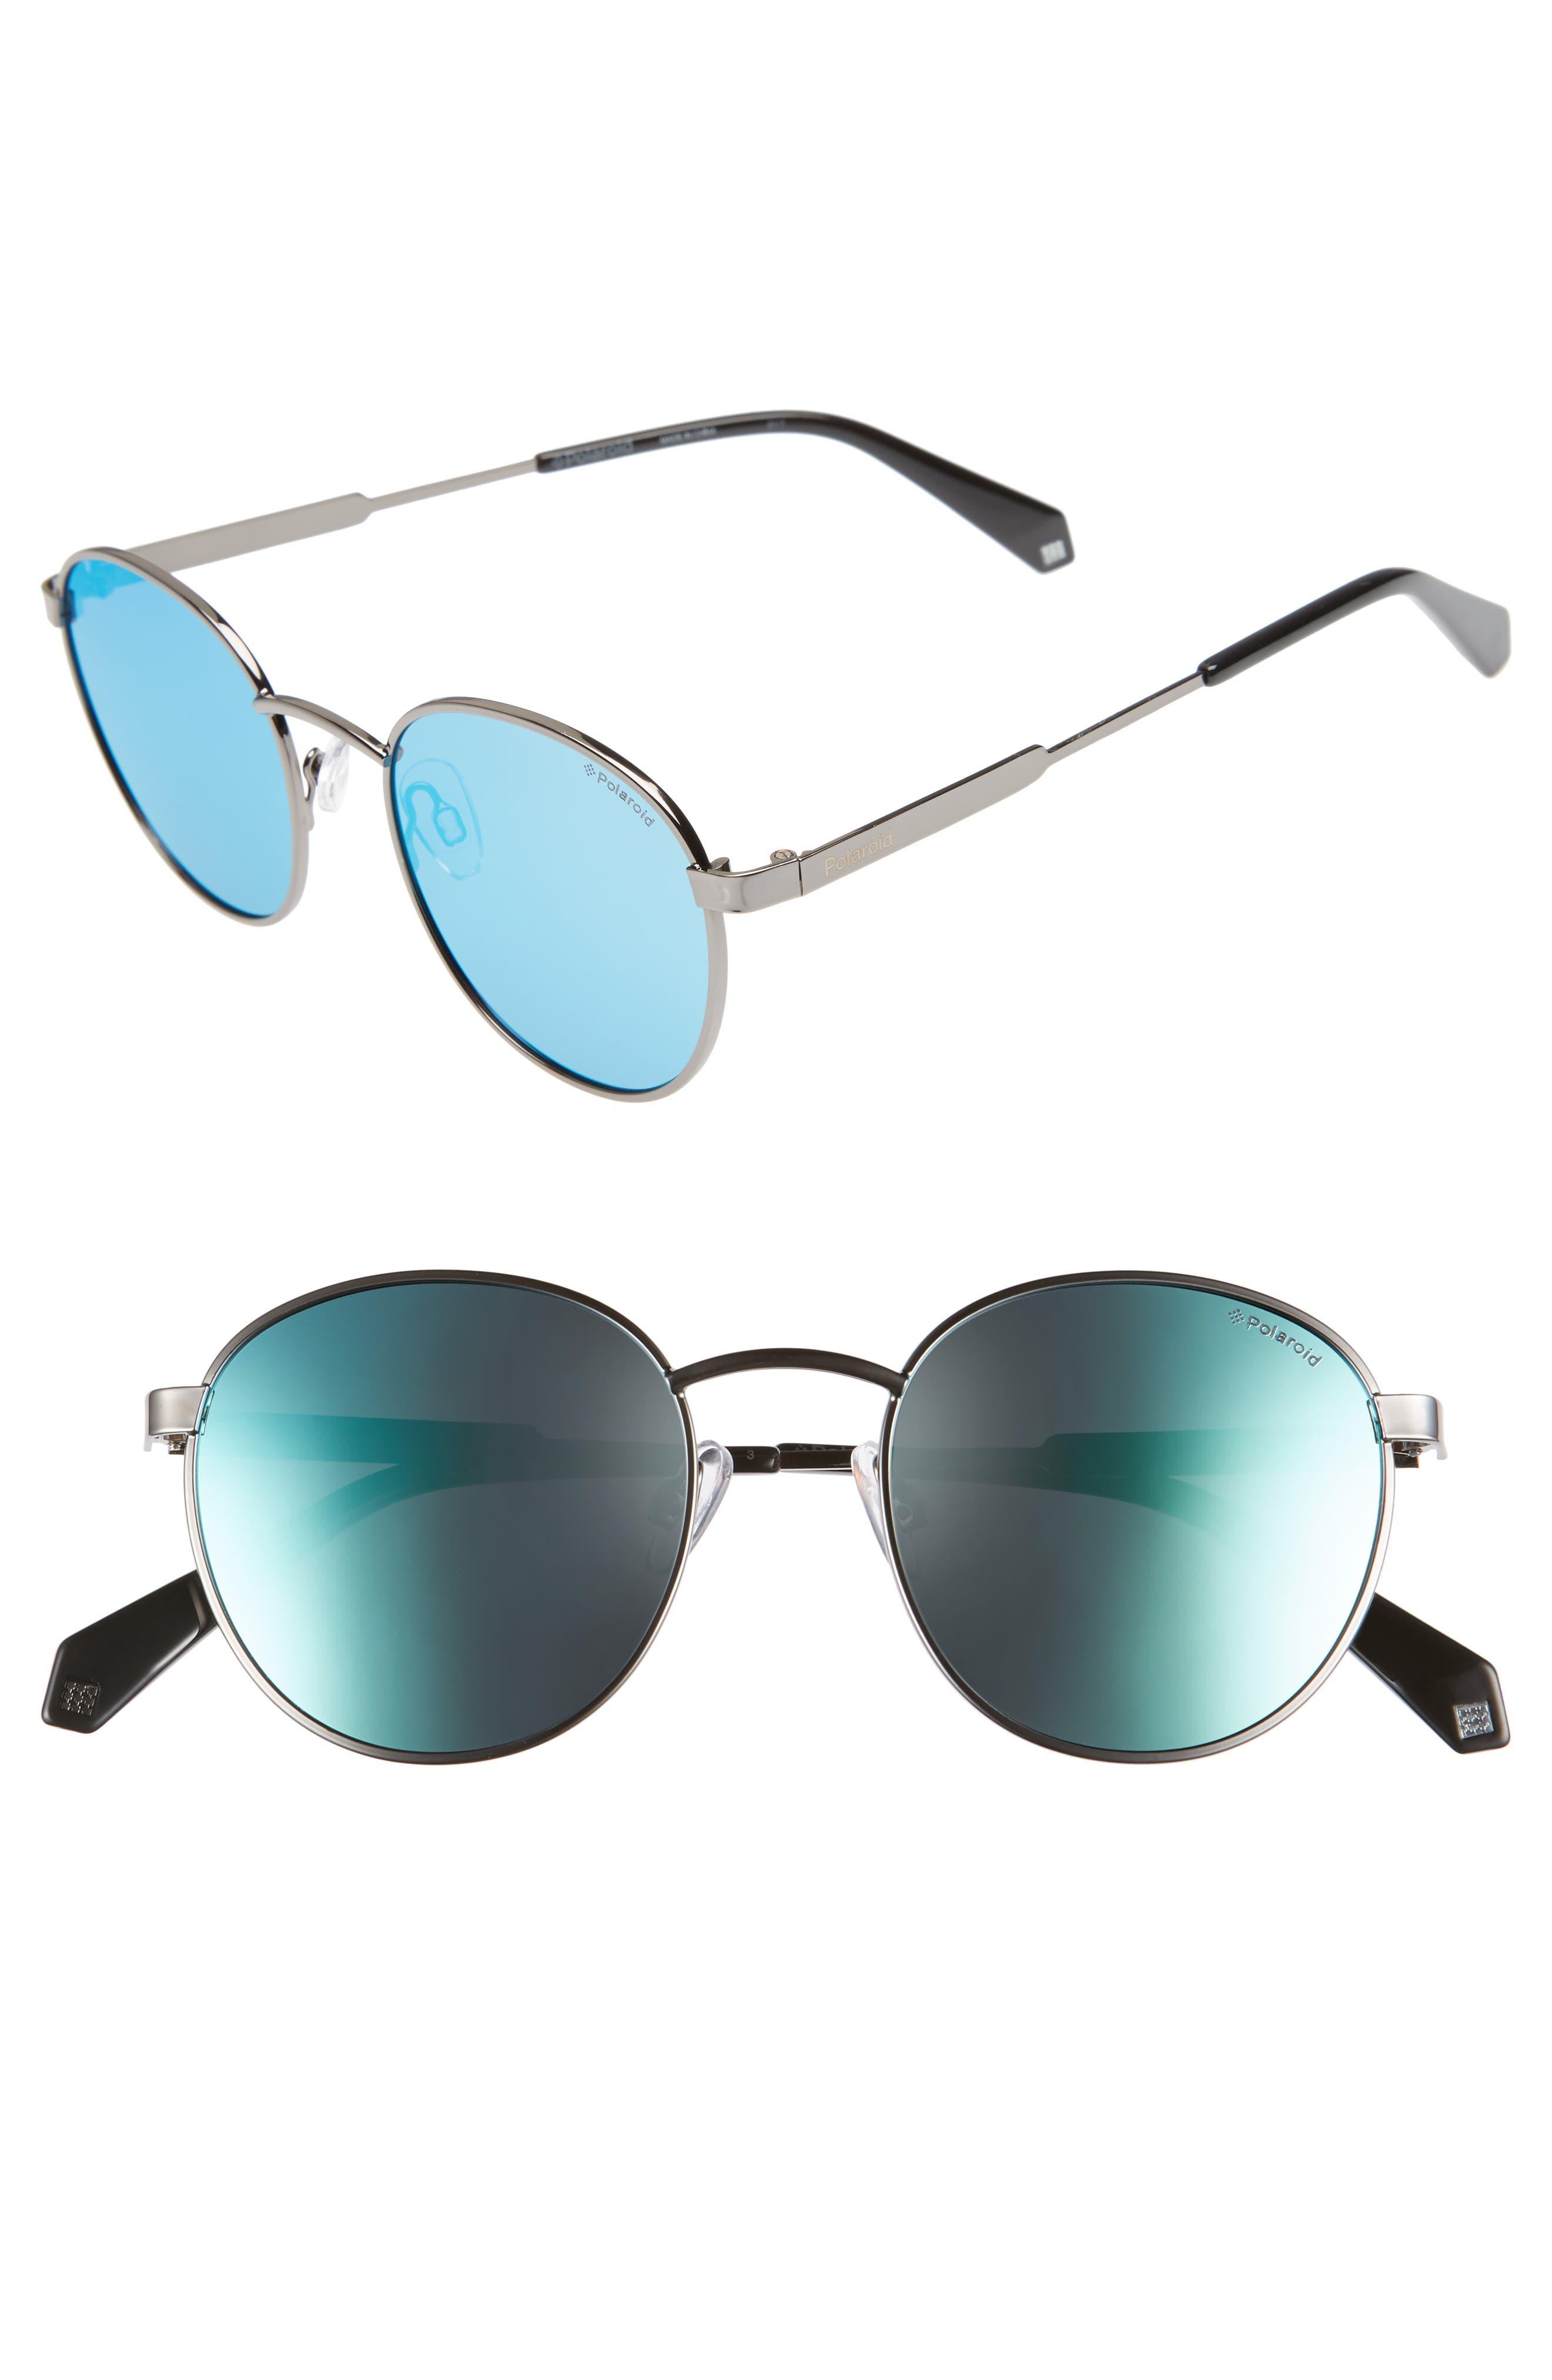 Polaroid 51Mm Polarized Round Sunglasses - Ruthenium